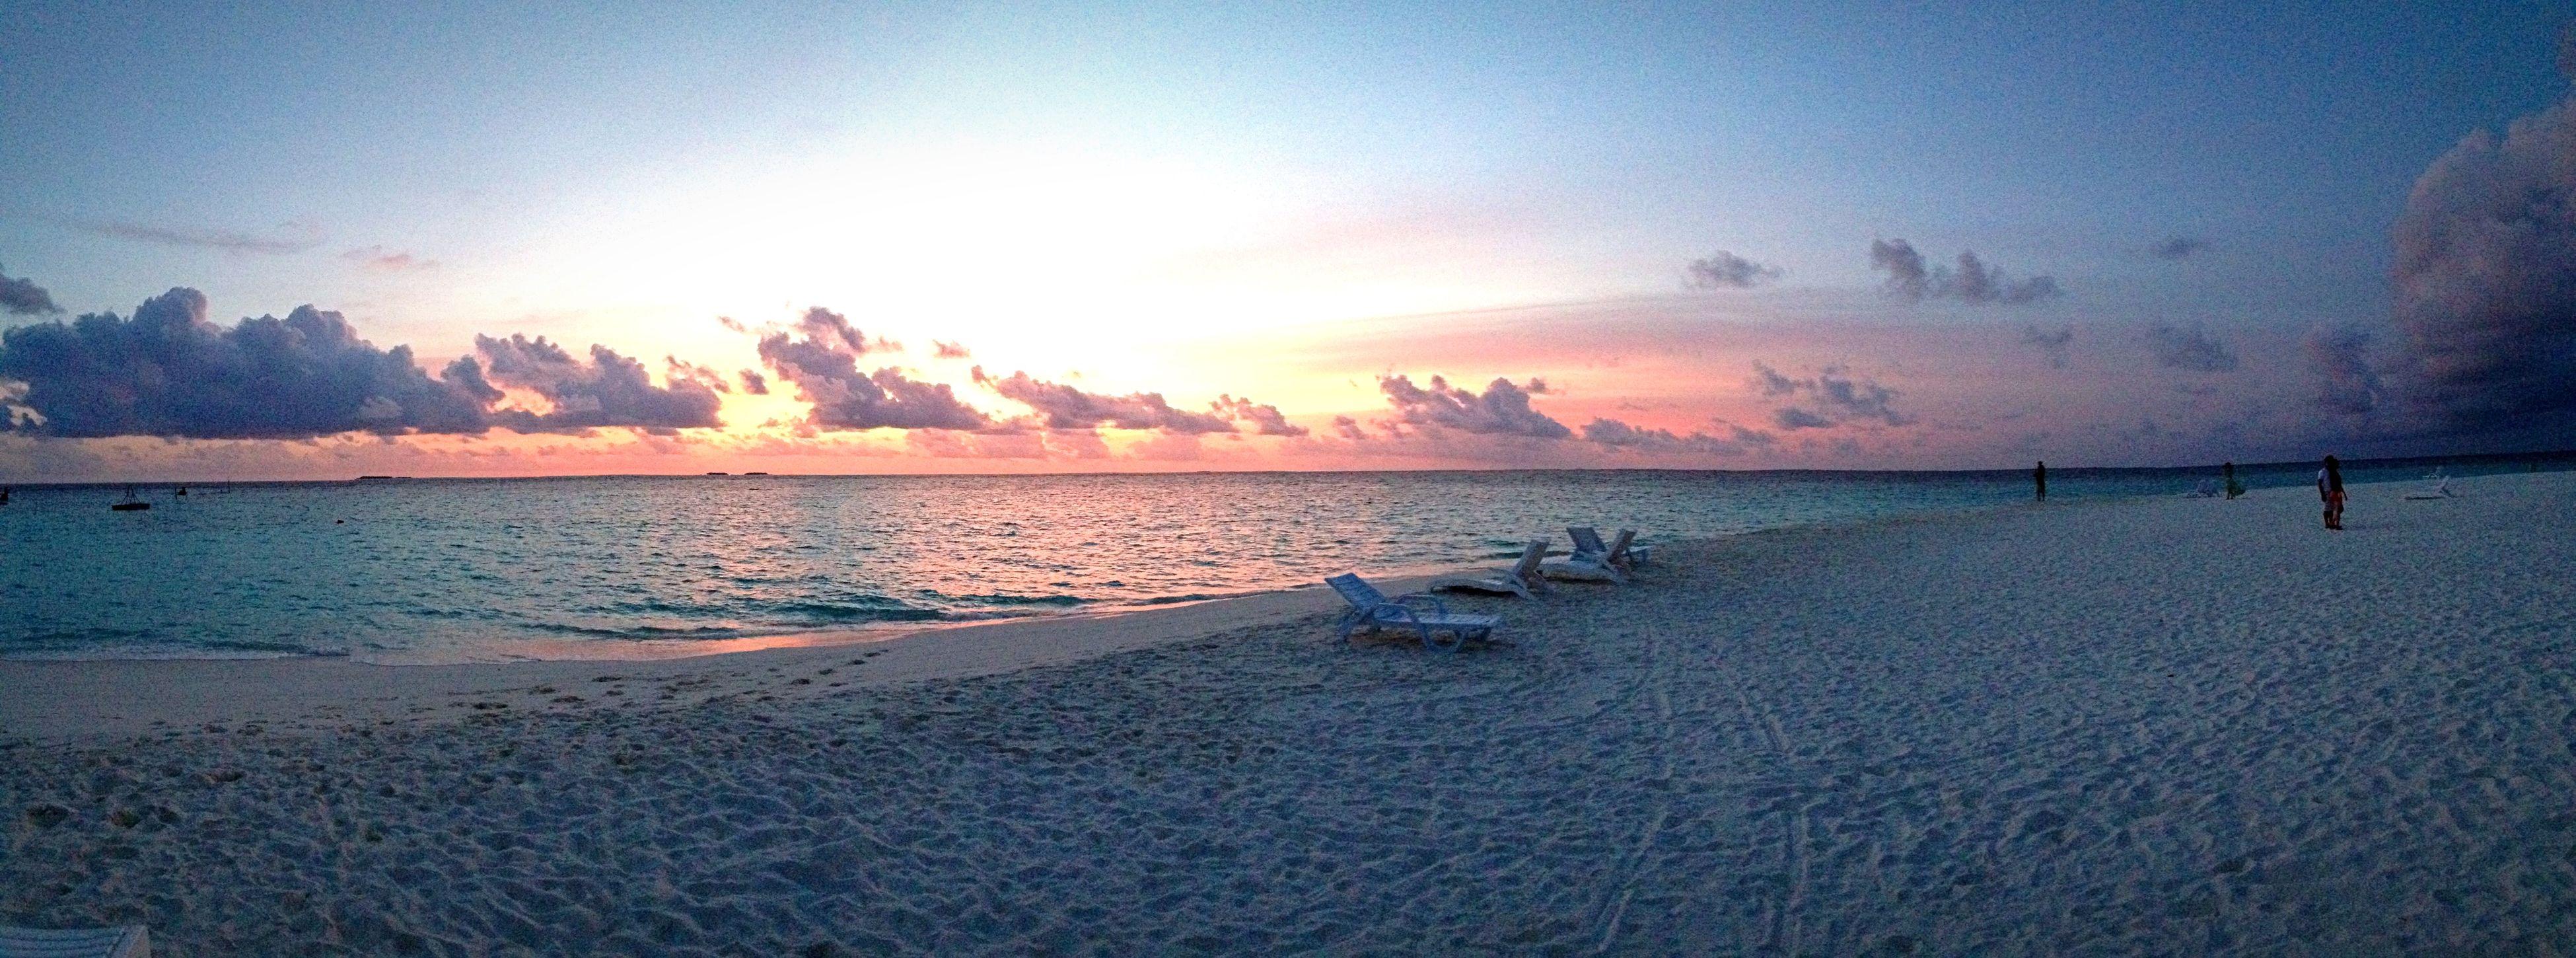 water, sunset, tranquil scene, scenics, tranquility, sea, beauty in nature, sky, beach, nature, shore, idyllic, sun, cloud - sky, sand, non-urban scene, horizon over water, sunlight, reflection, remote